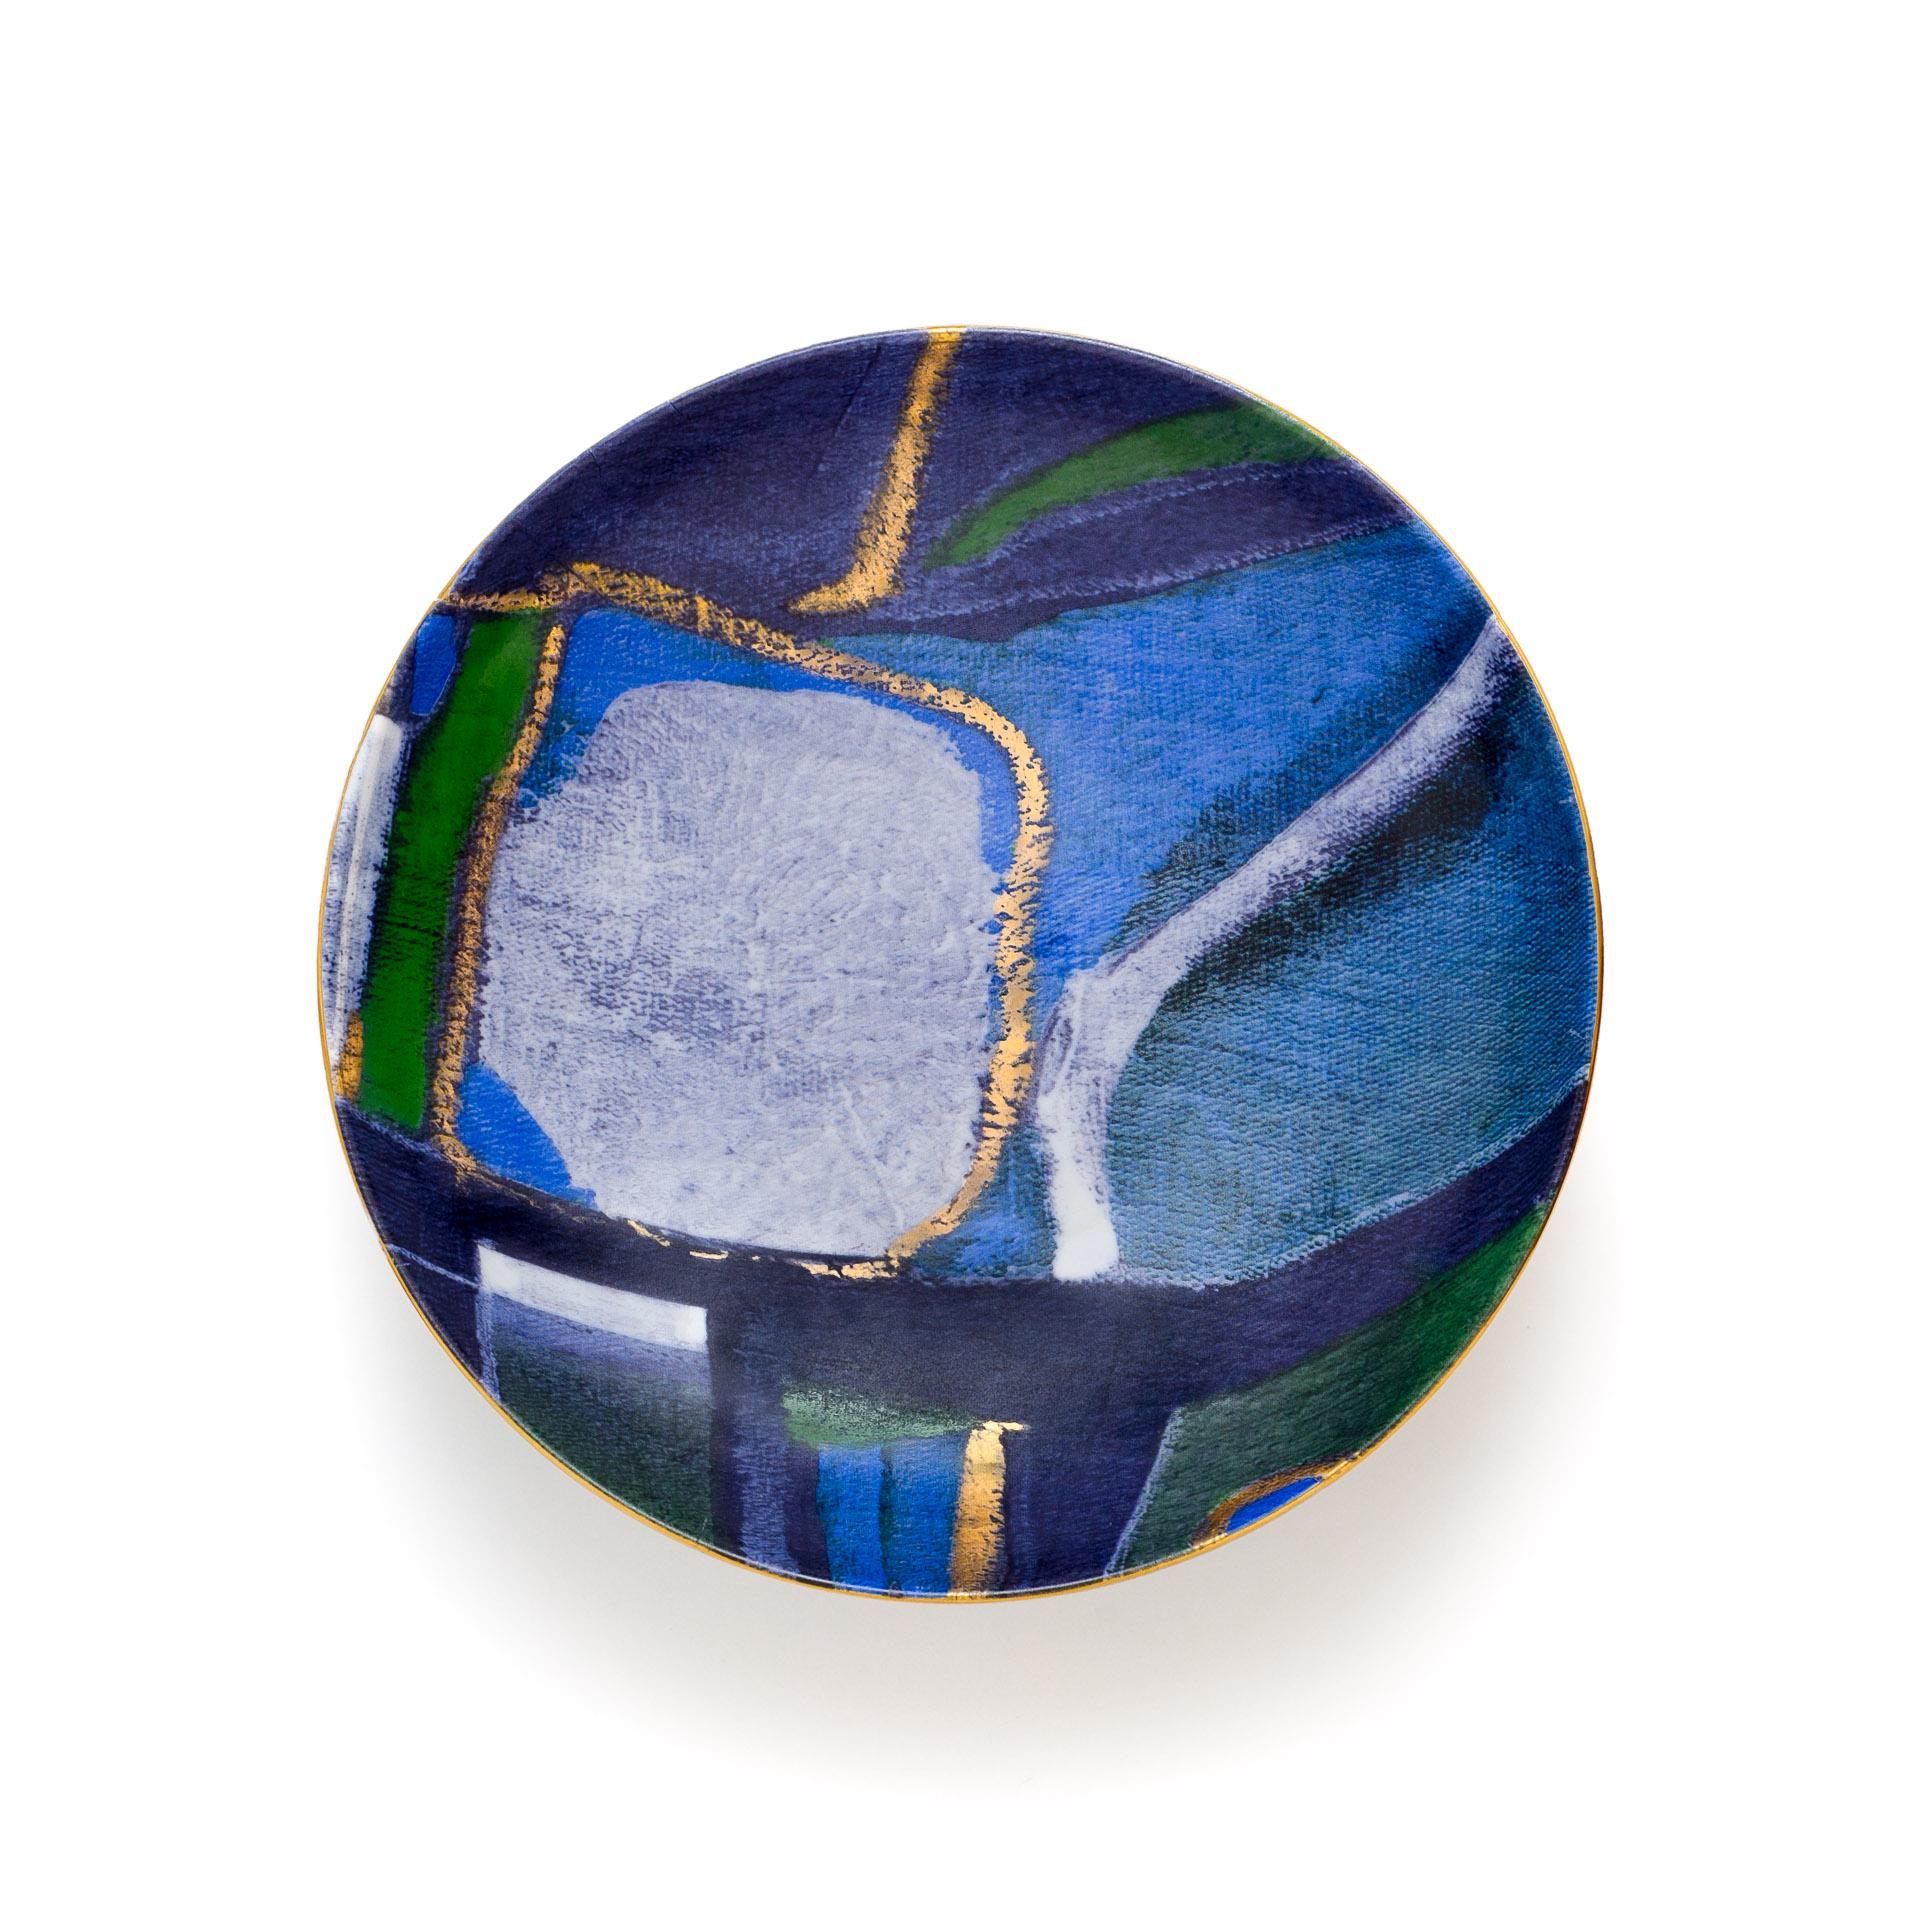 Marco Lorenzetto Ceramic Bowl-2330.jpg